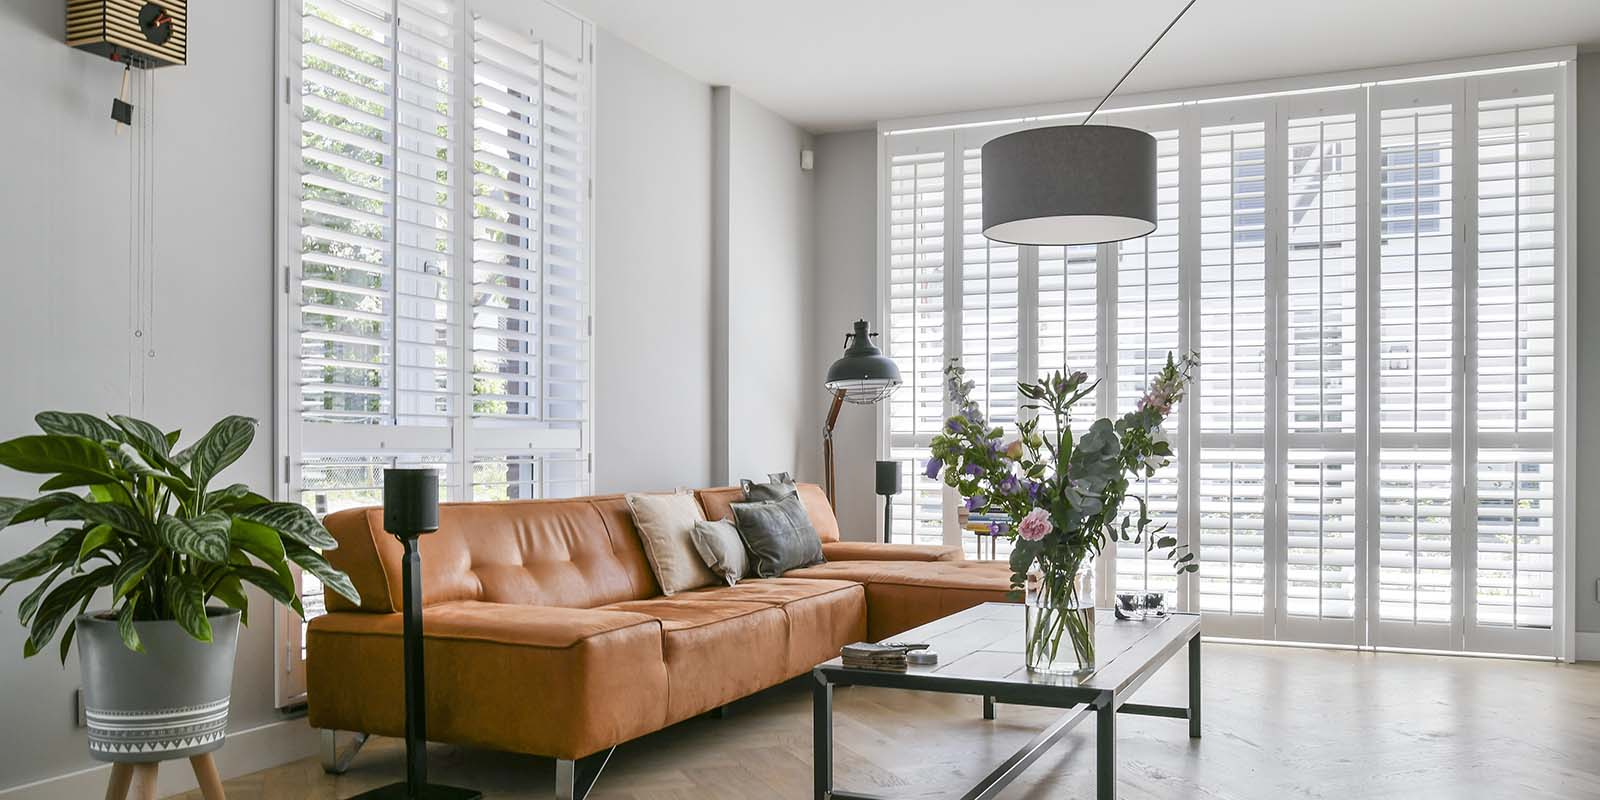 Raamdecoratie, blend window fashion, the art of living,